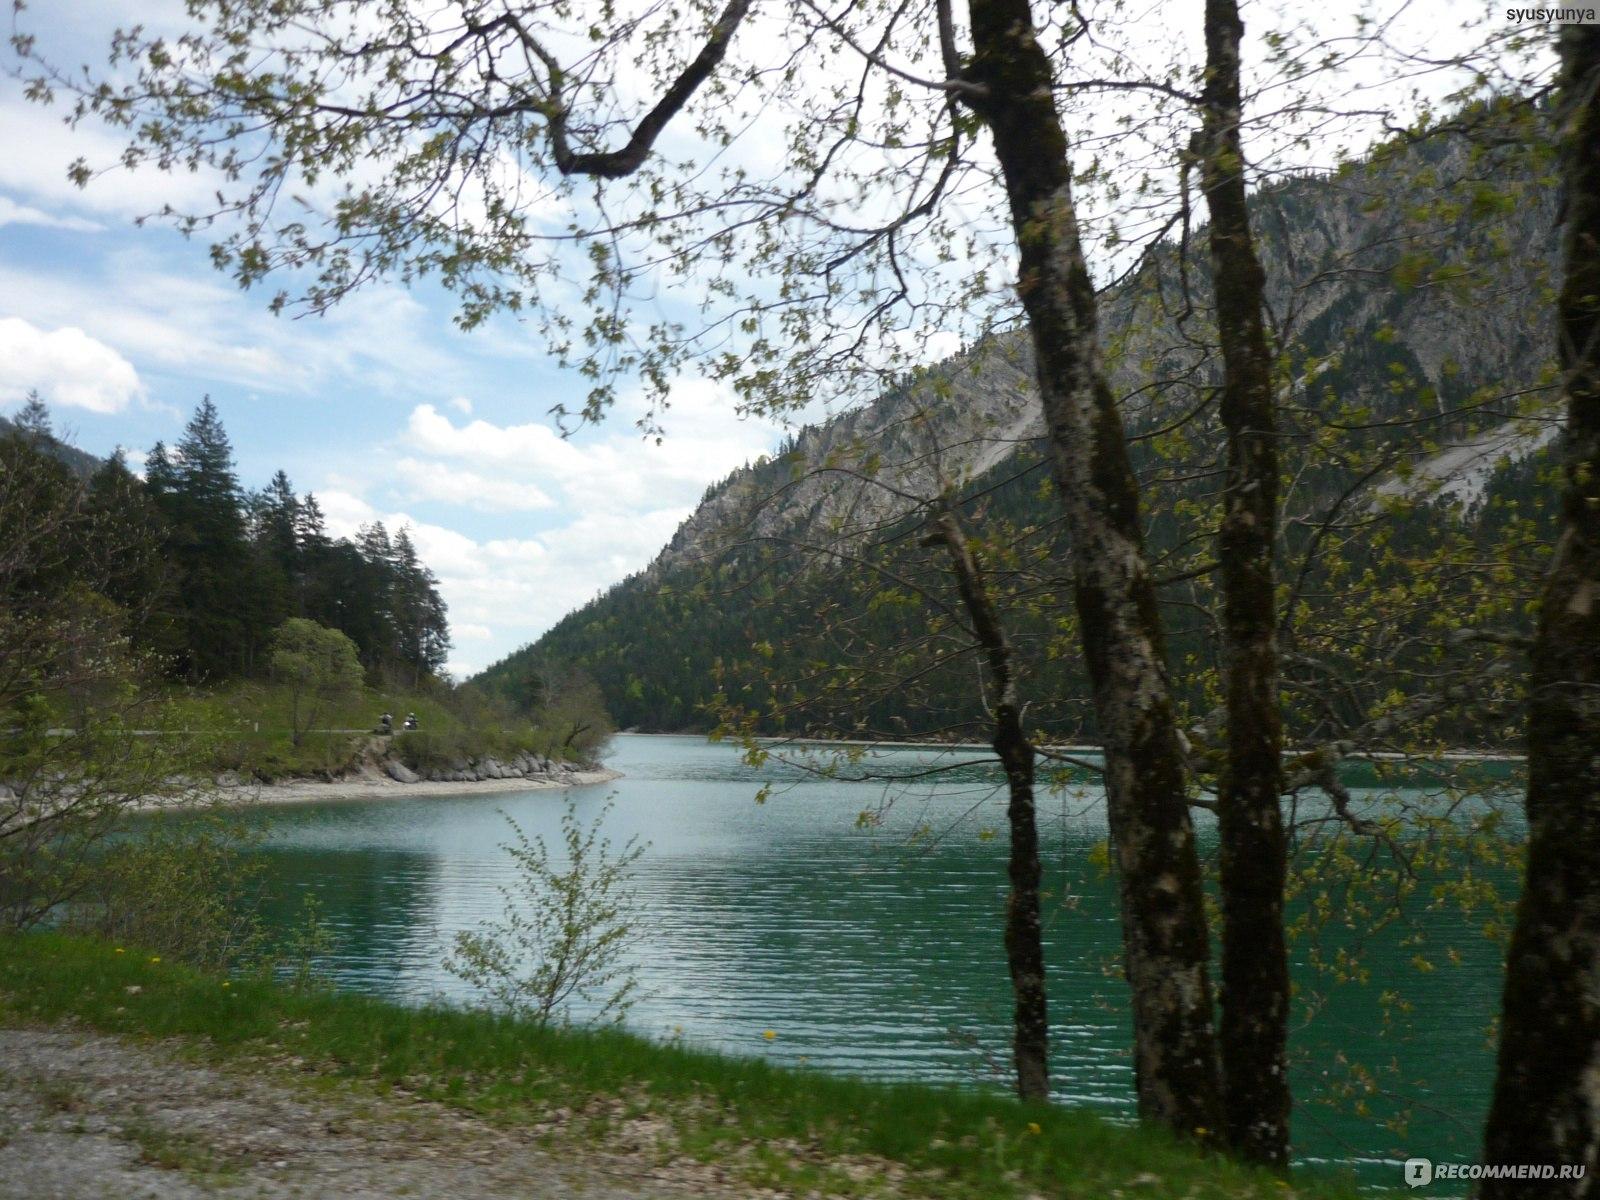 Обои австрия, alps, тироль, austria, tirol, Lake plansee, озеро планзее. Пейзажи foto 9